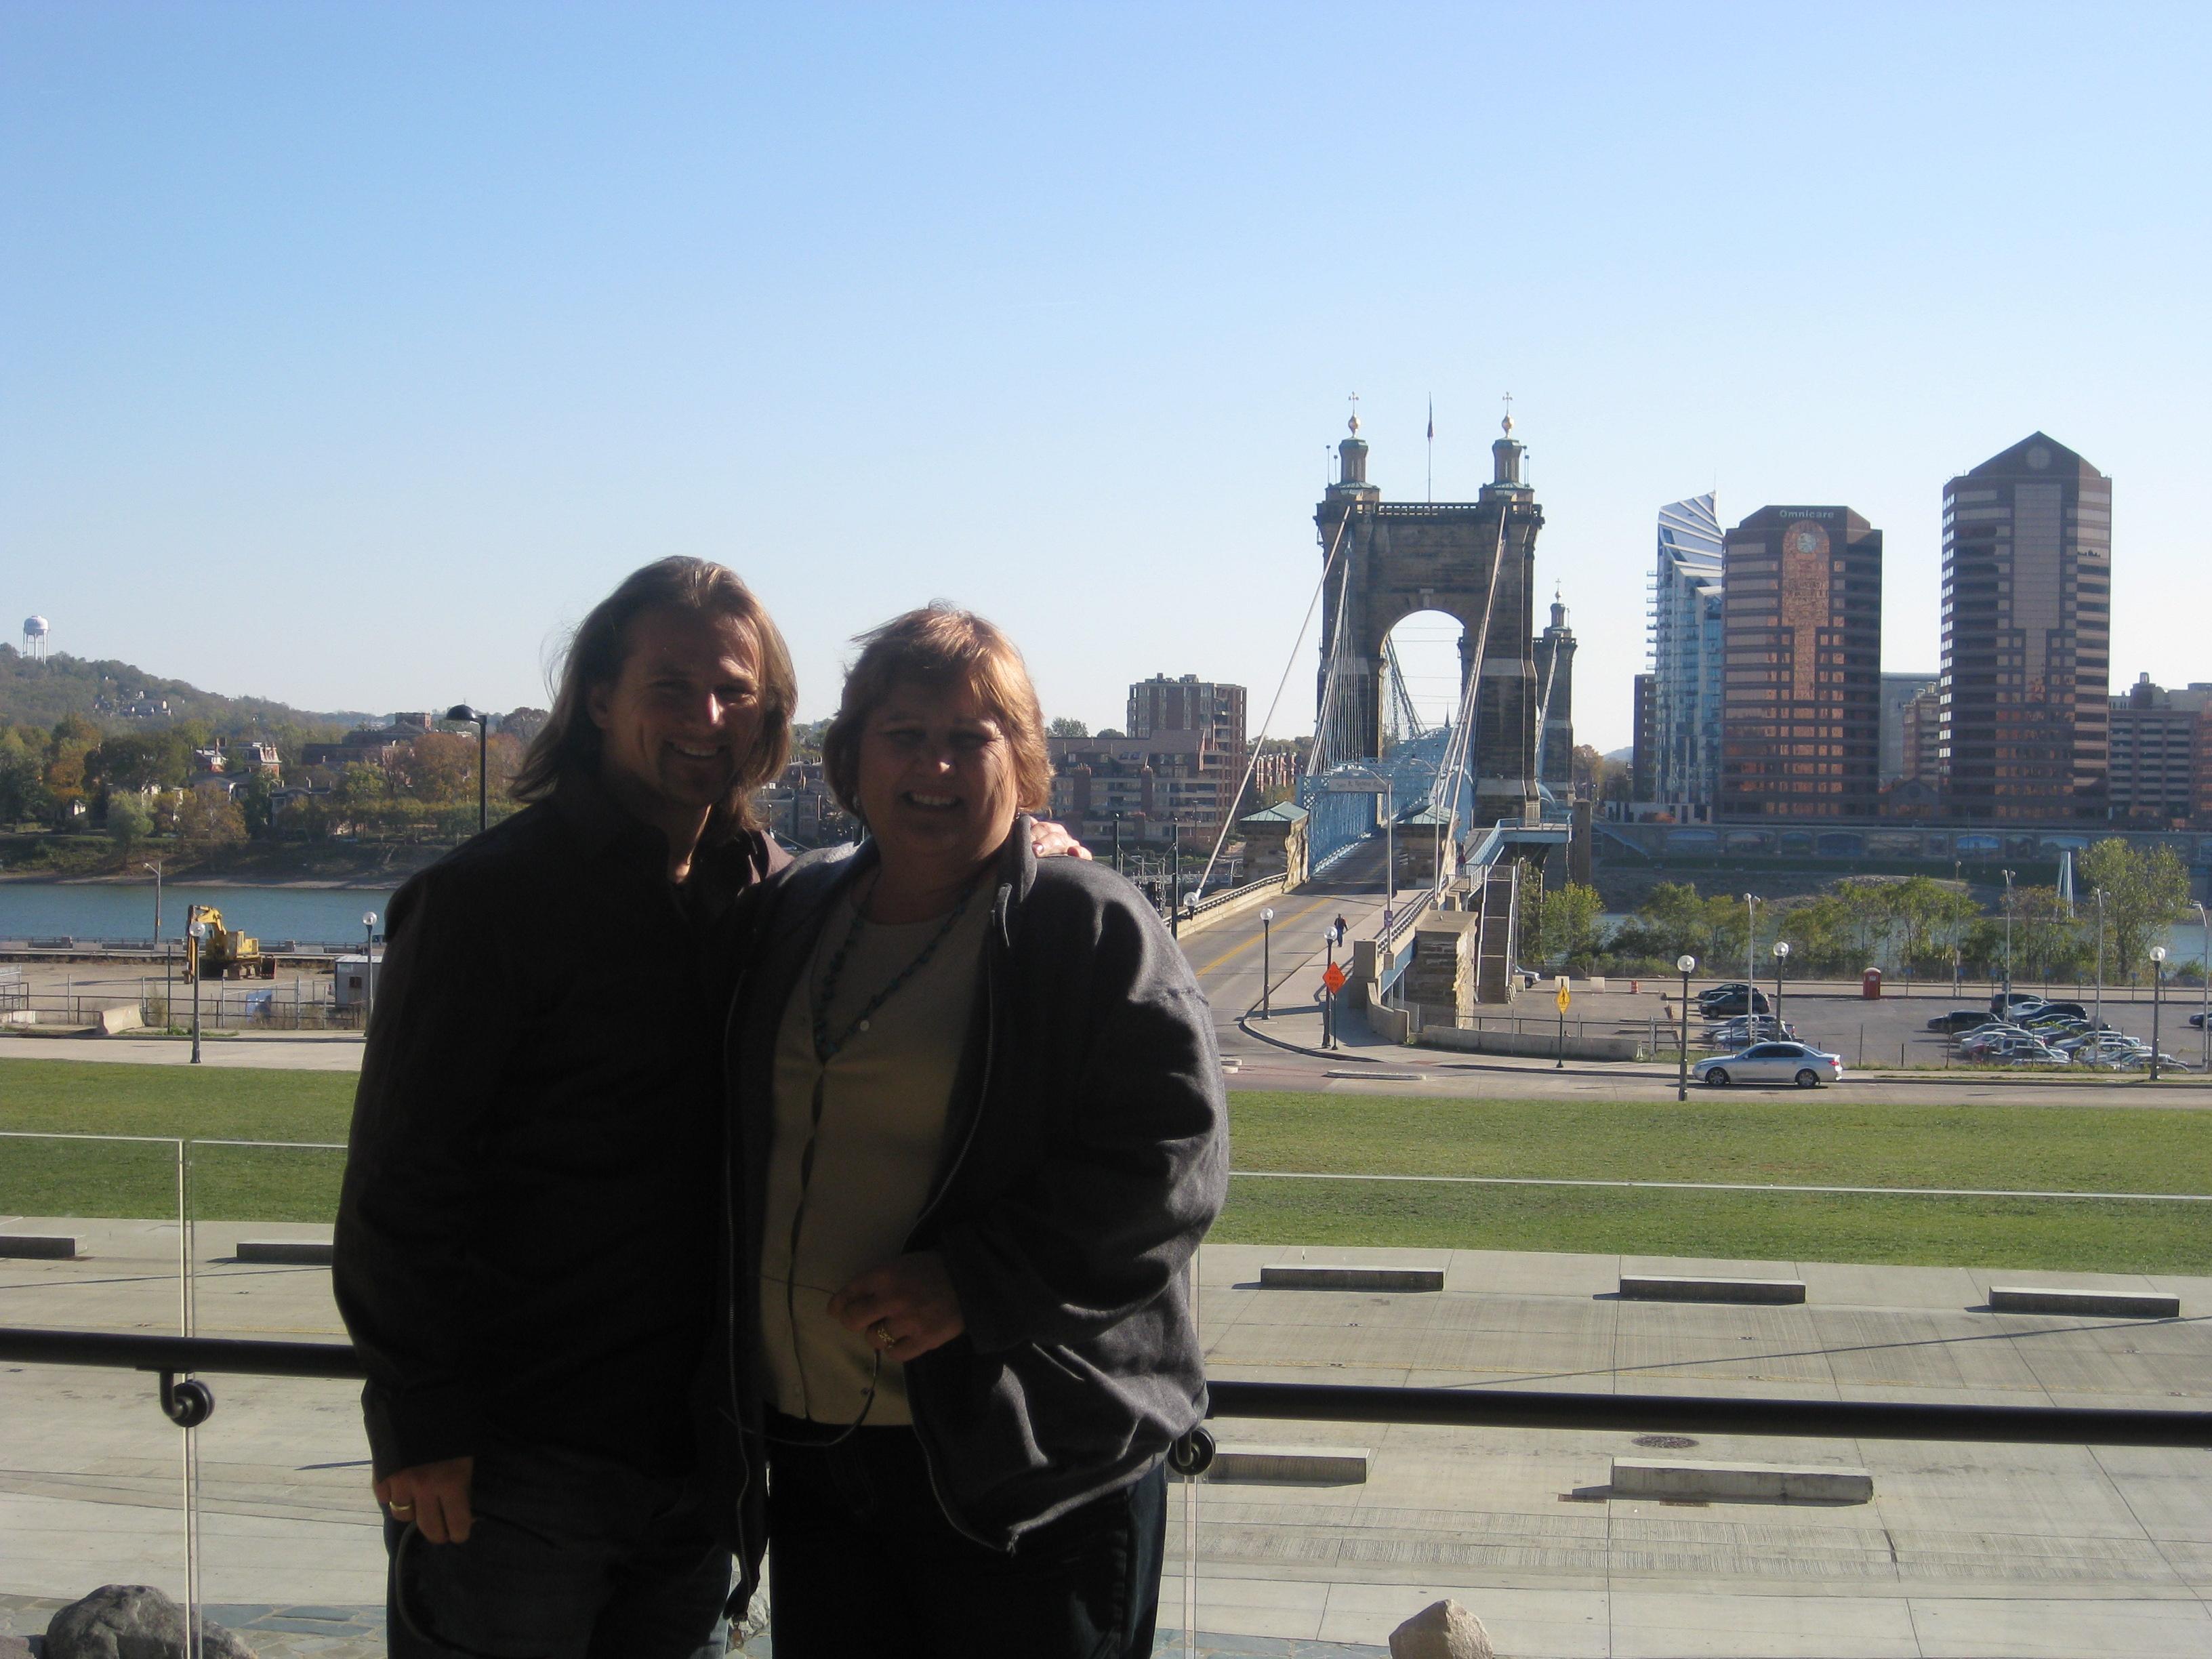 Mom and I Overlooking the Kentucky/Ohio River in Cincinnati, OH